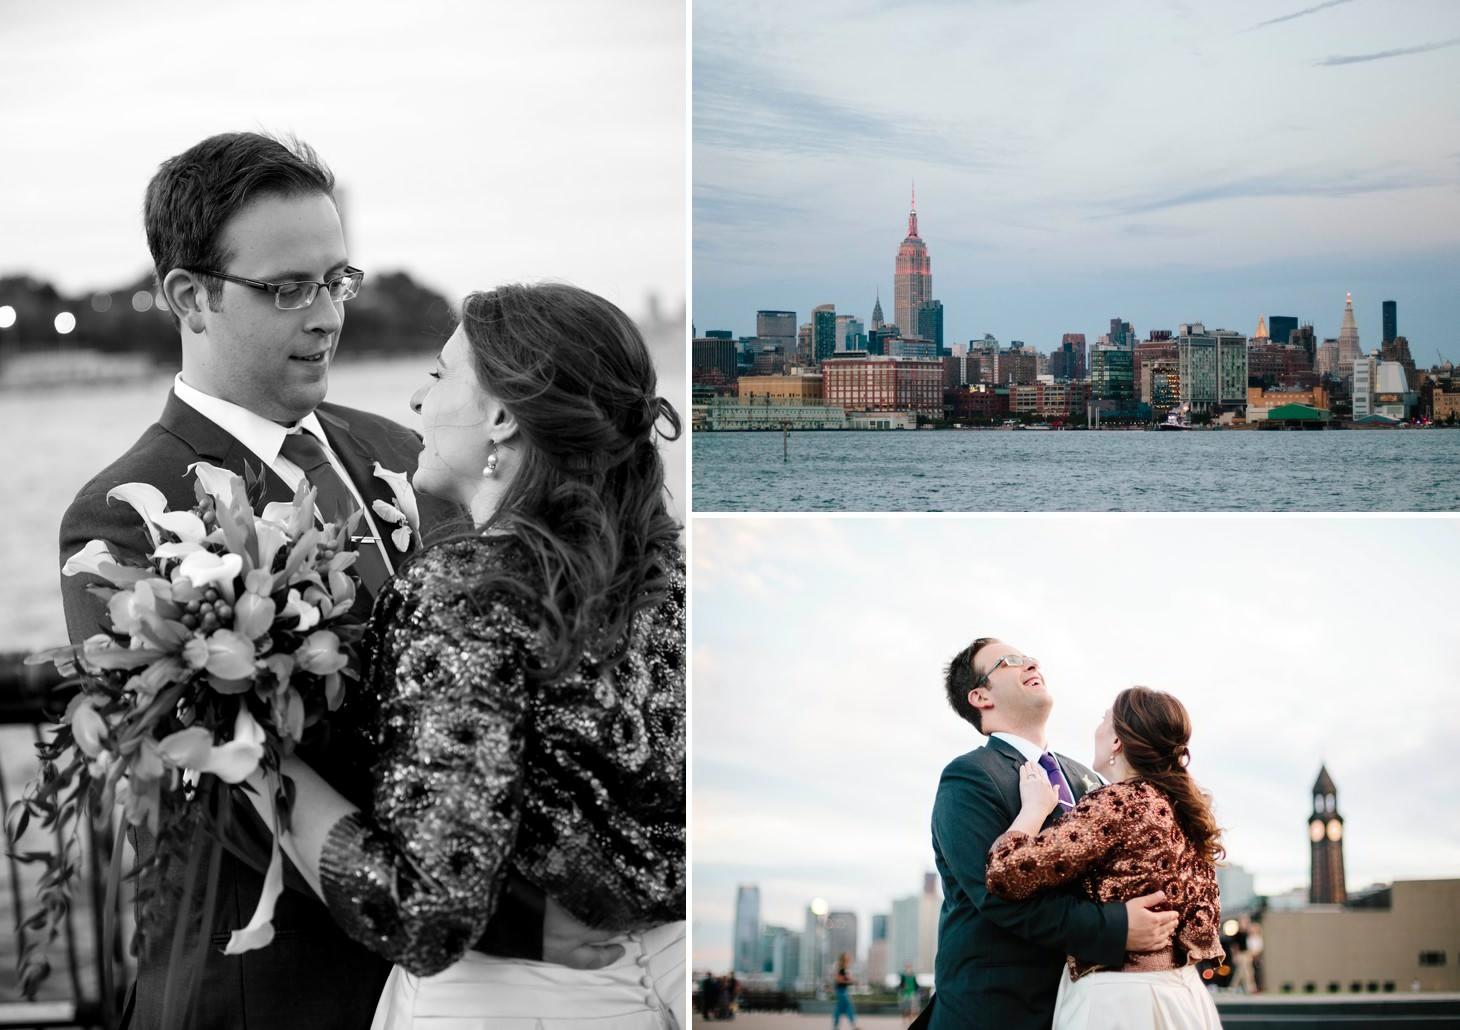 040-nyc-wedding-photographer-hoboken-waterfront-wedding-photos-smitten-chickens.jpg